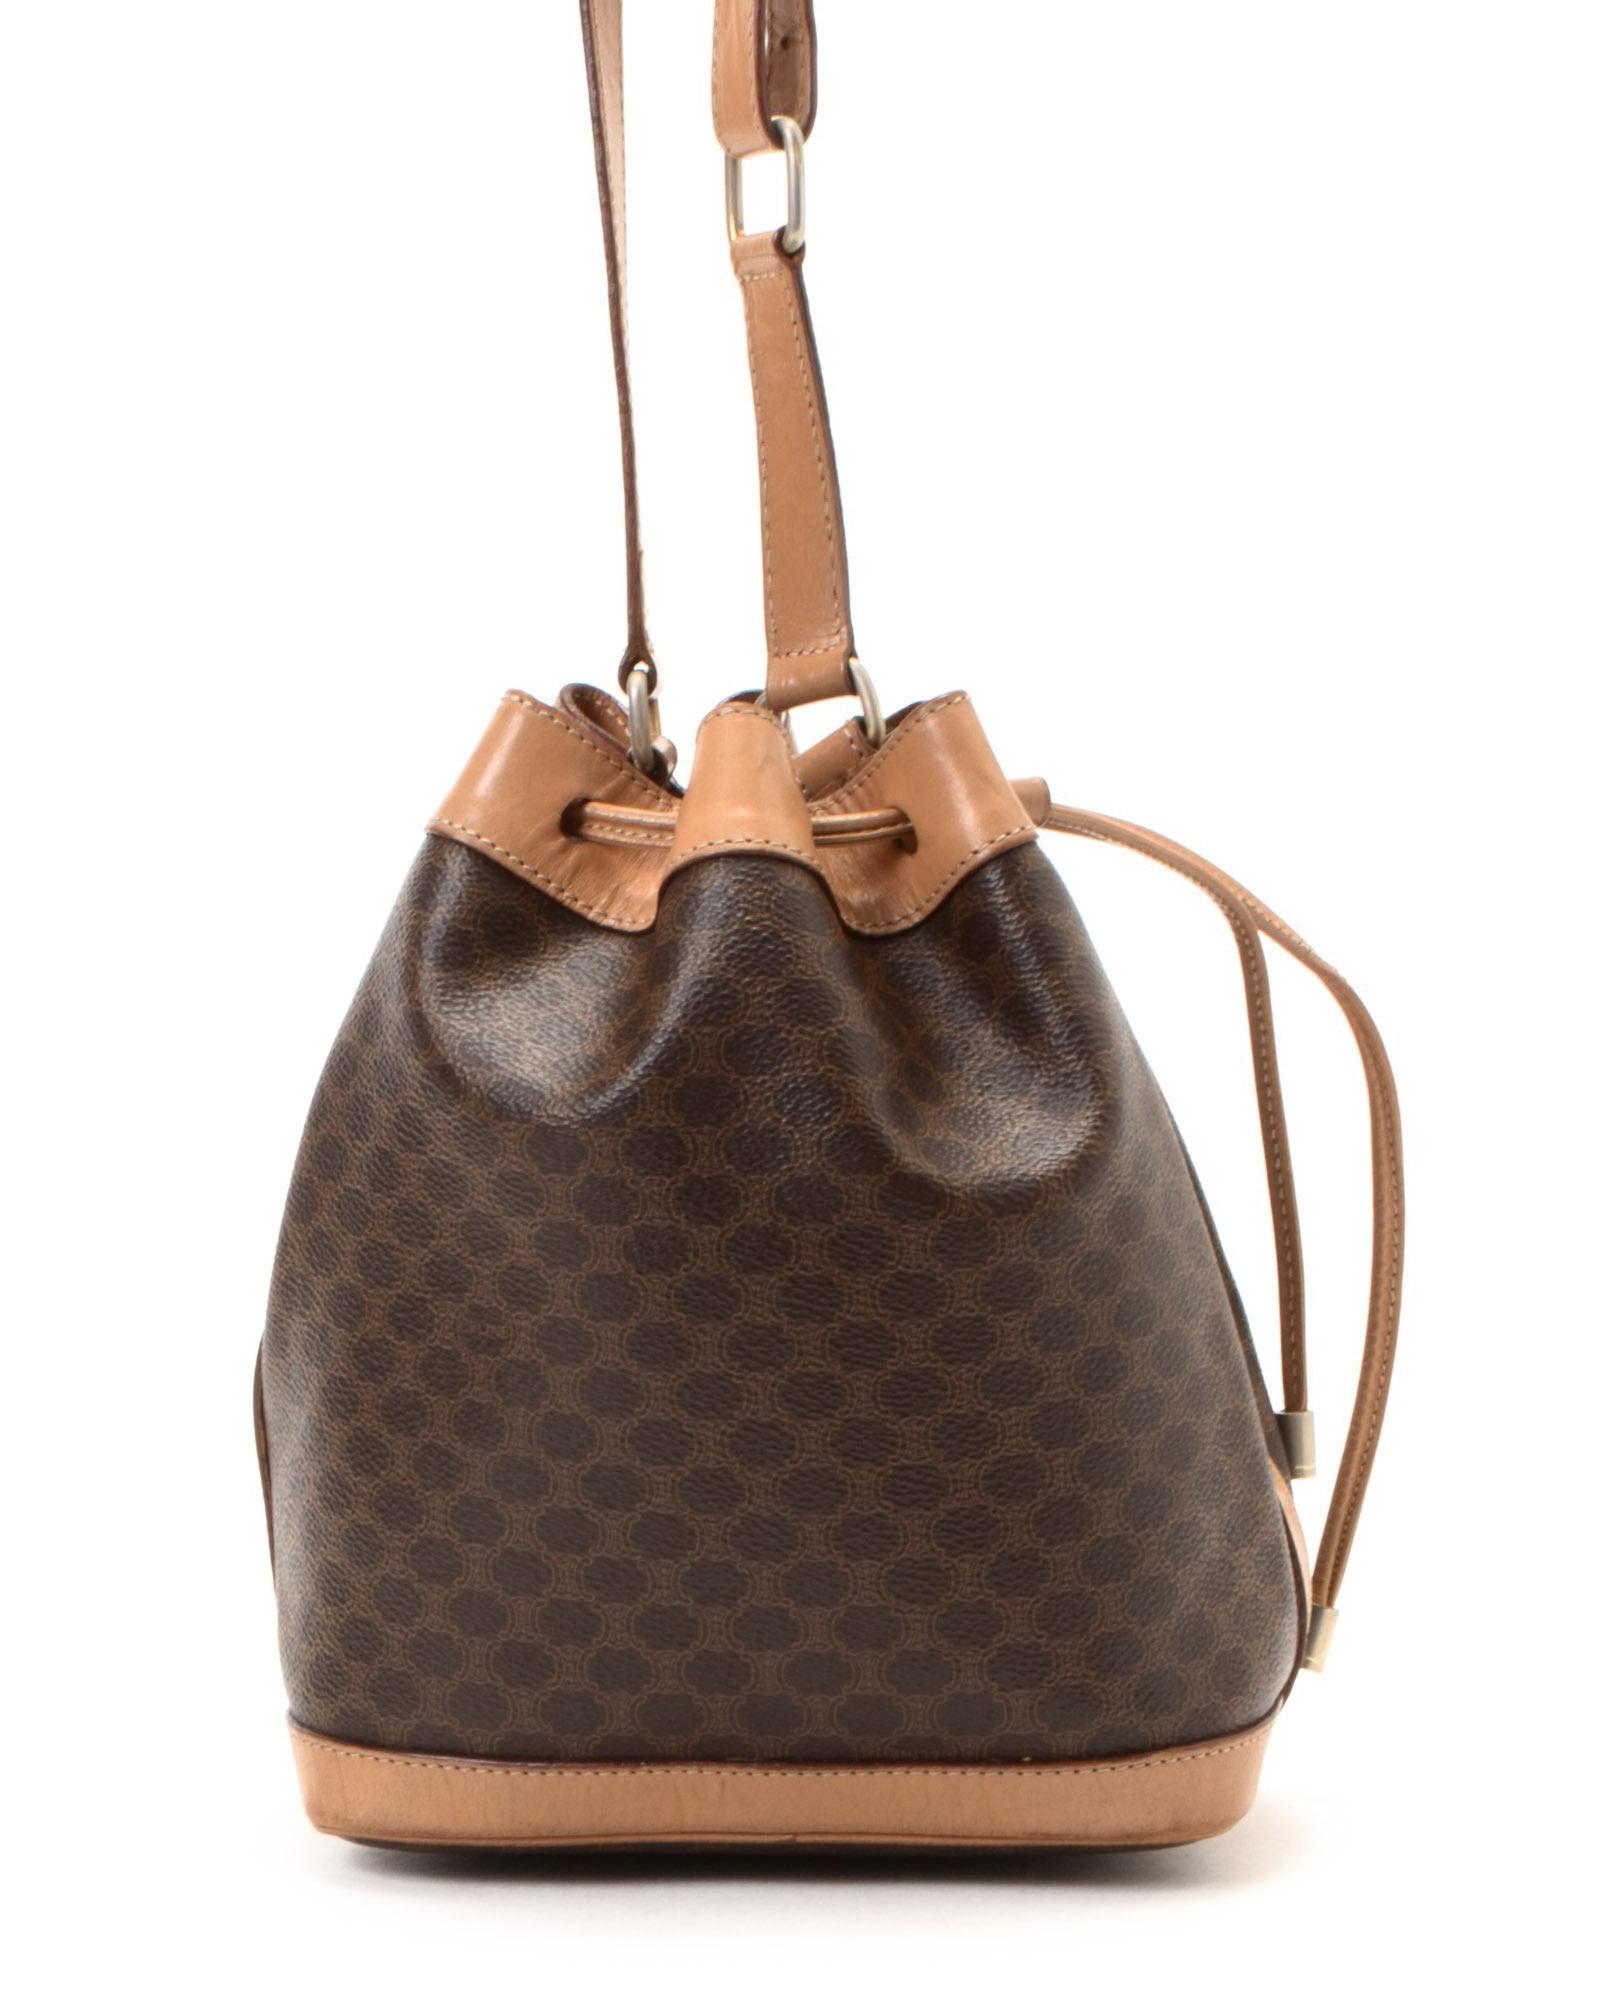 C¨¦line Brown Shoulder Bag - Vintage in Brown | Lyst